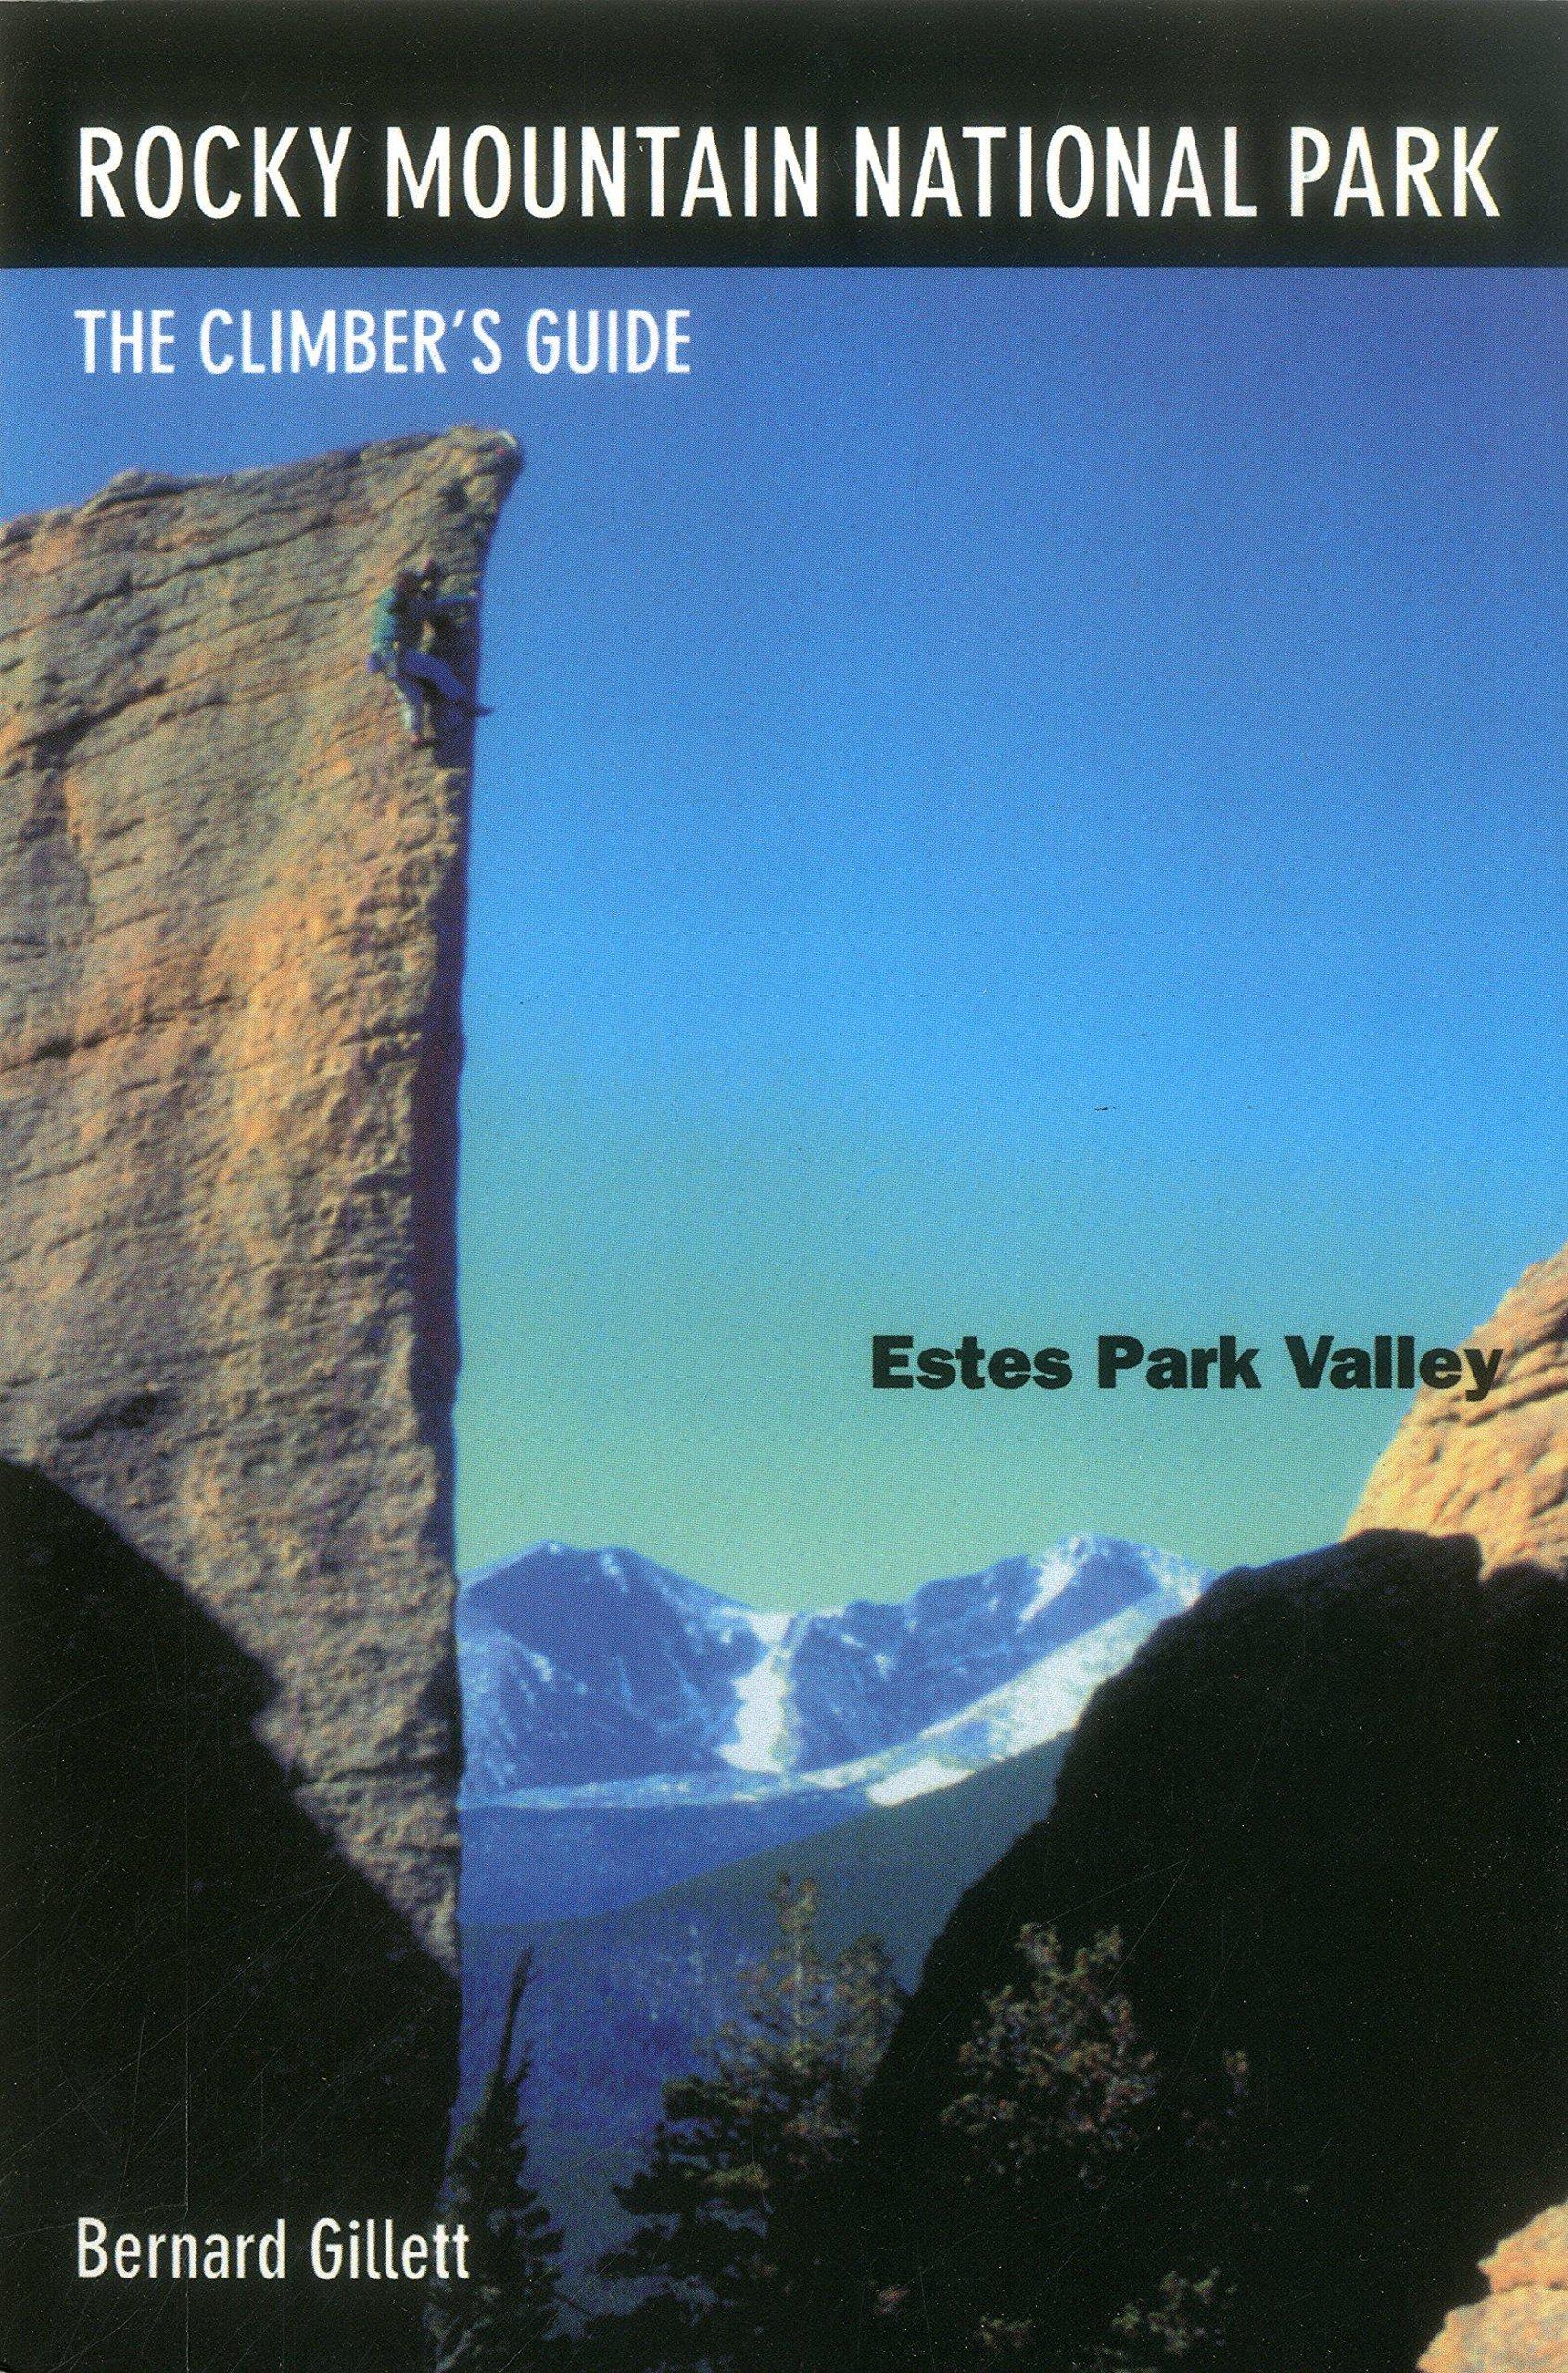 Rocky Mountain National Park Estes Valley The ClimberS Guide Bernard Gillett 9780964369849 Amazon Books